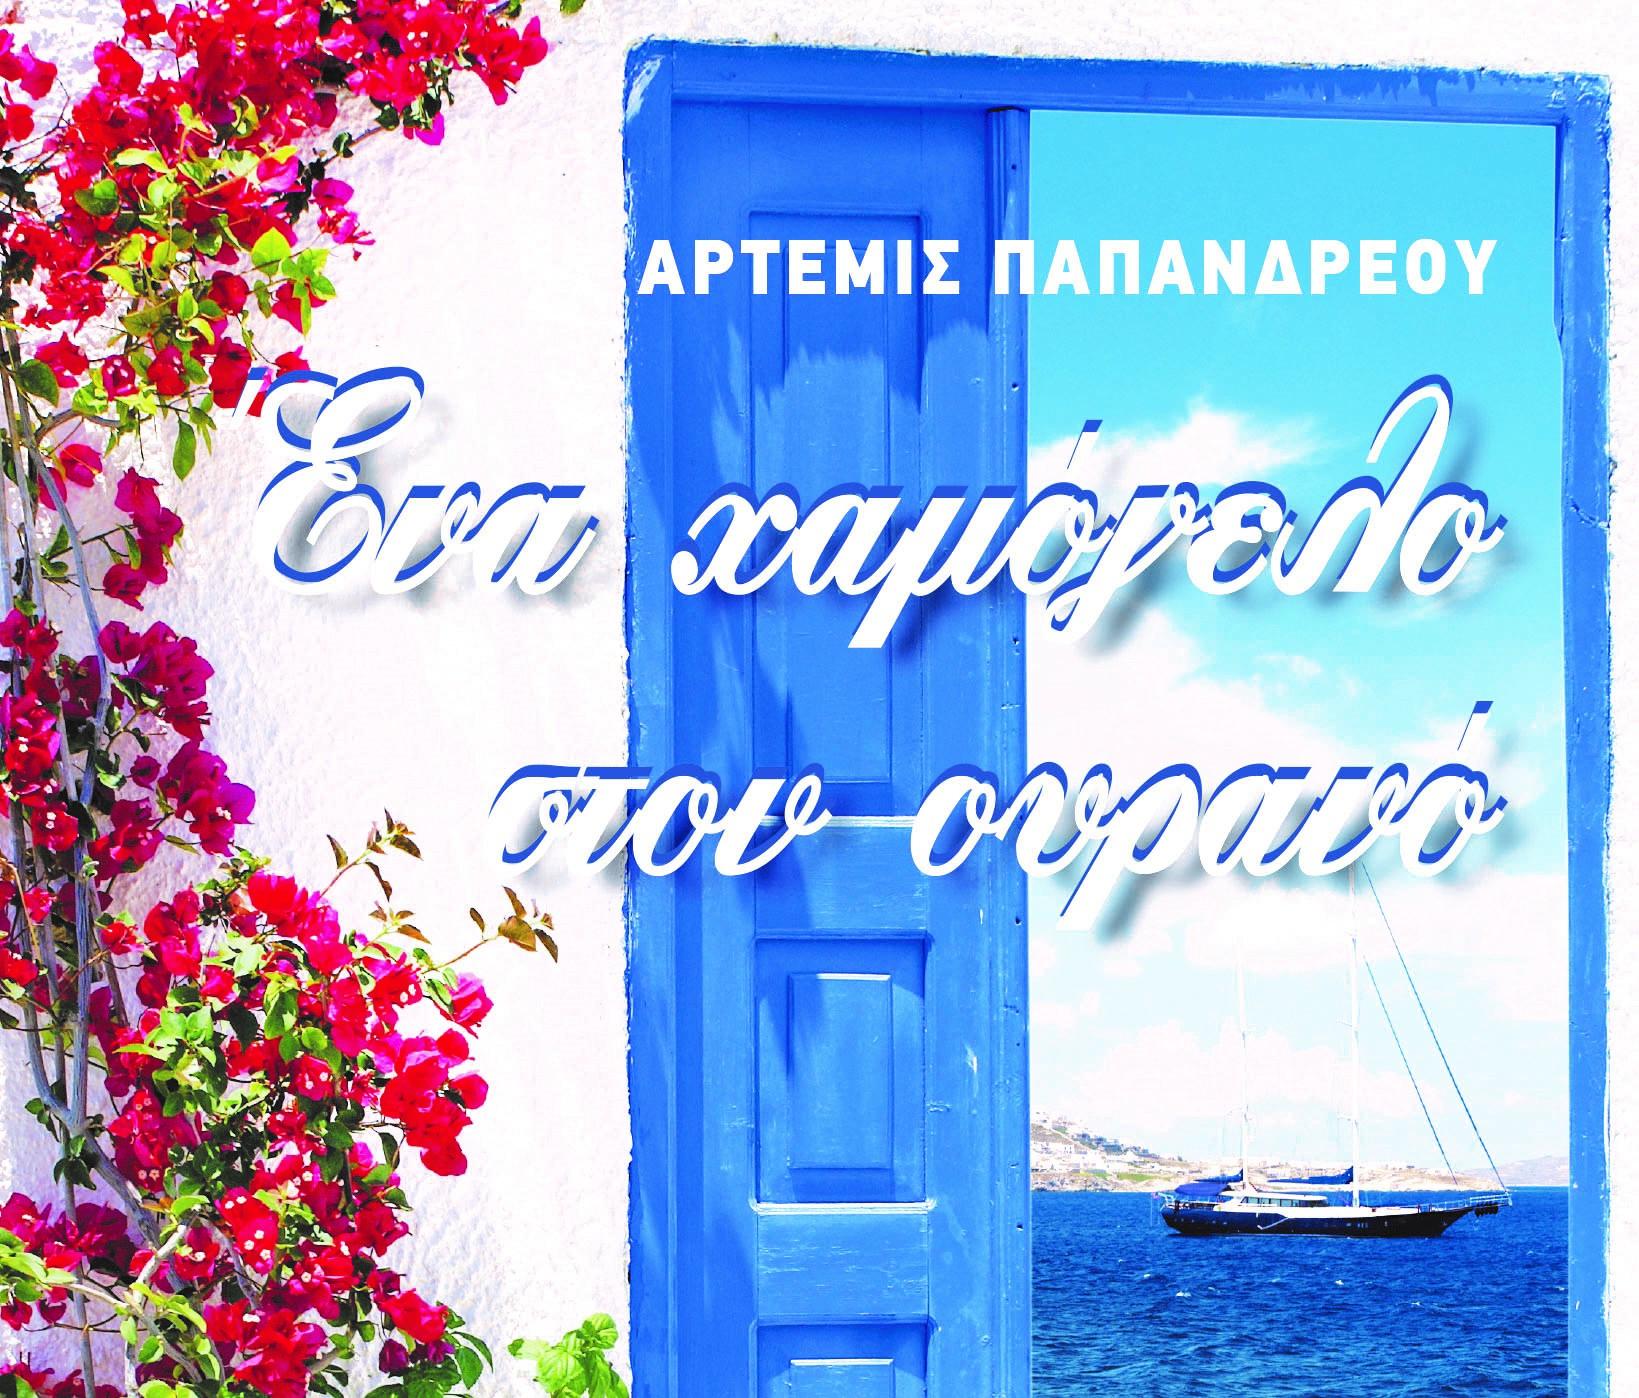 21725ba7d20 H Άρτεμις Παπανδρέου παρουσιάζει το βιβλίο της «Ένα χαμόγελο στον ...